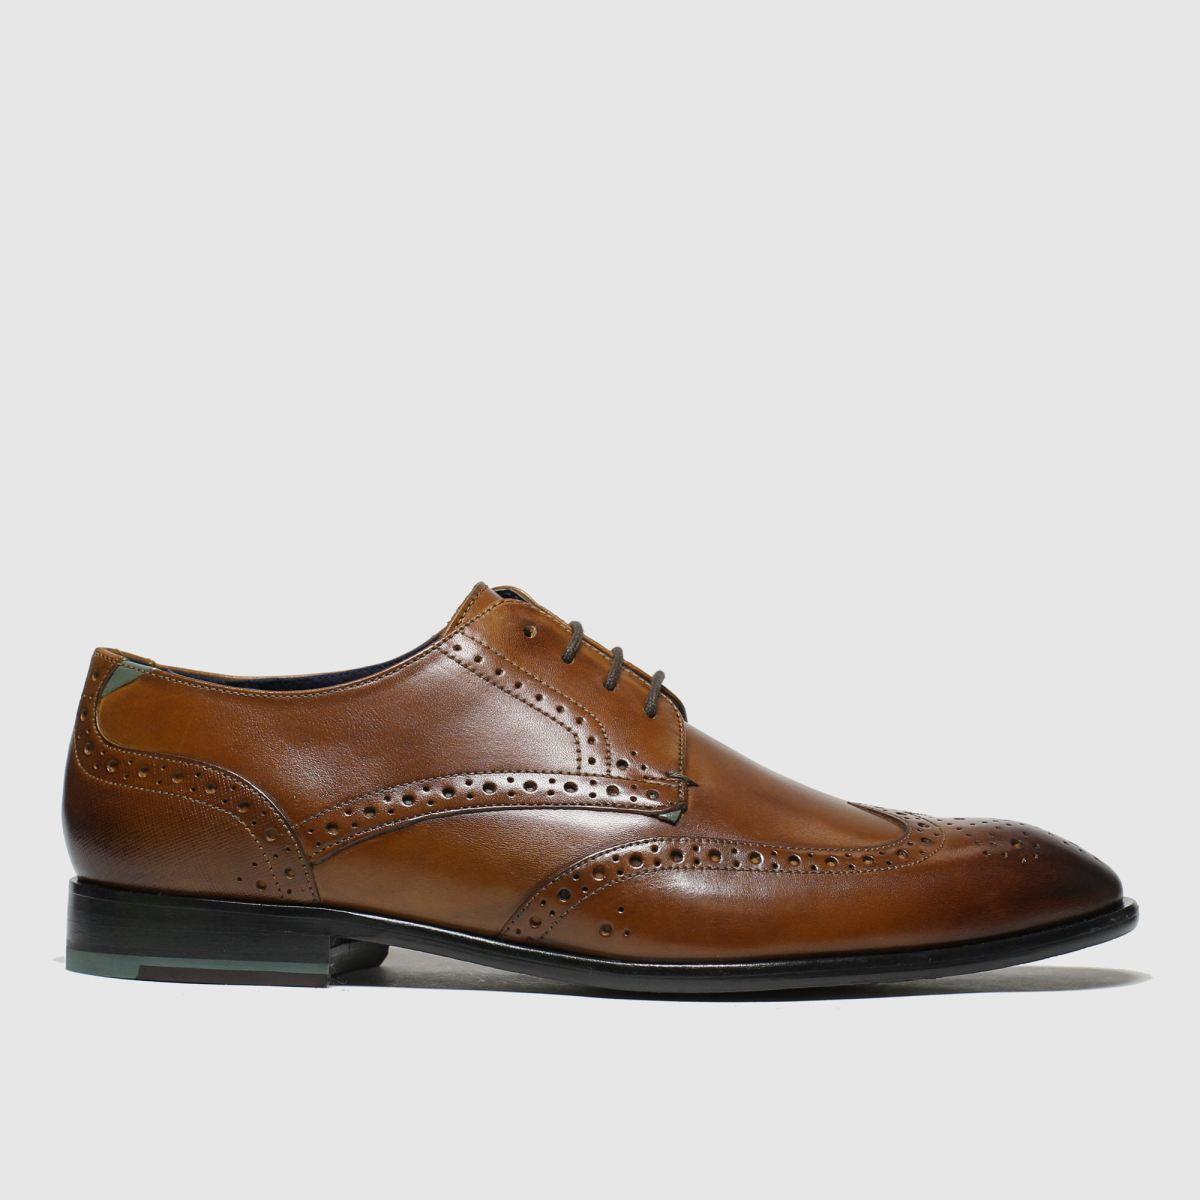 Ted Baker Tan Trvss Shoes